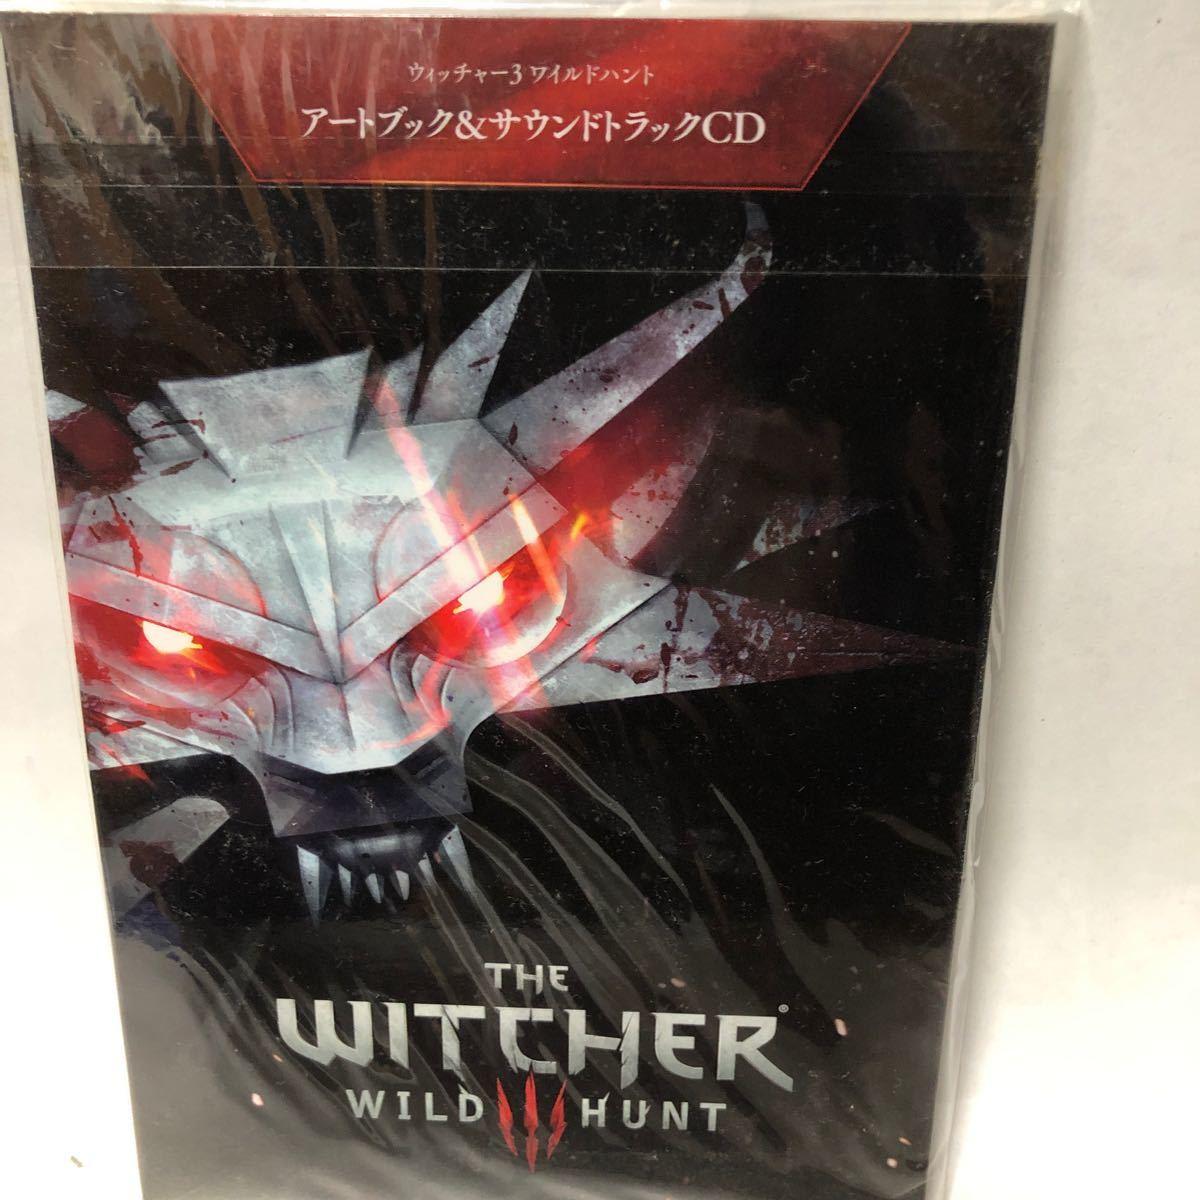 PS4 ウィッチャー3 ワイルドハント 初回限定盤特典アートブック&サウンドトラックCD